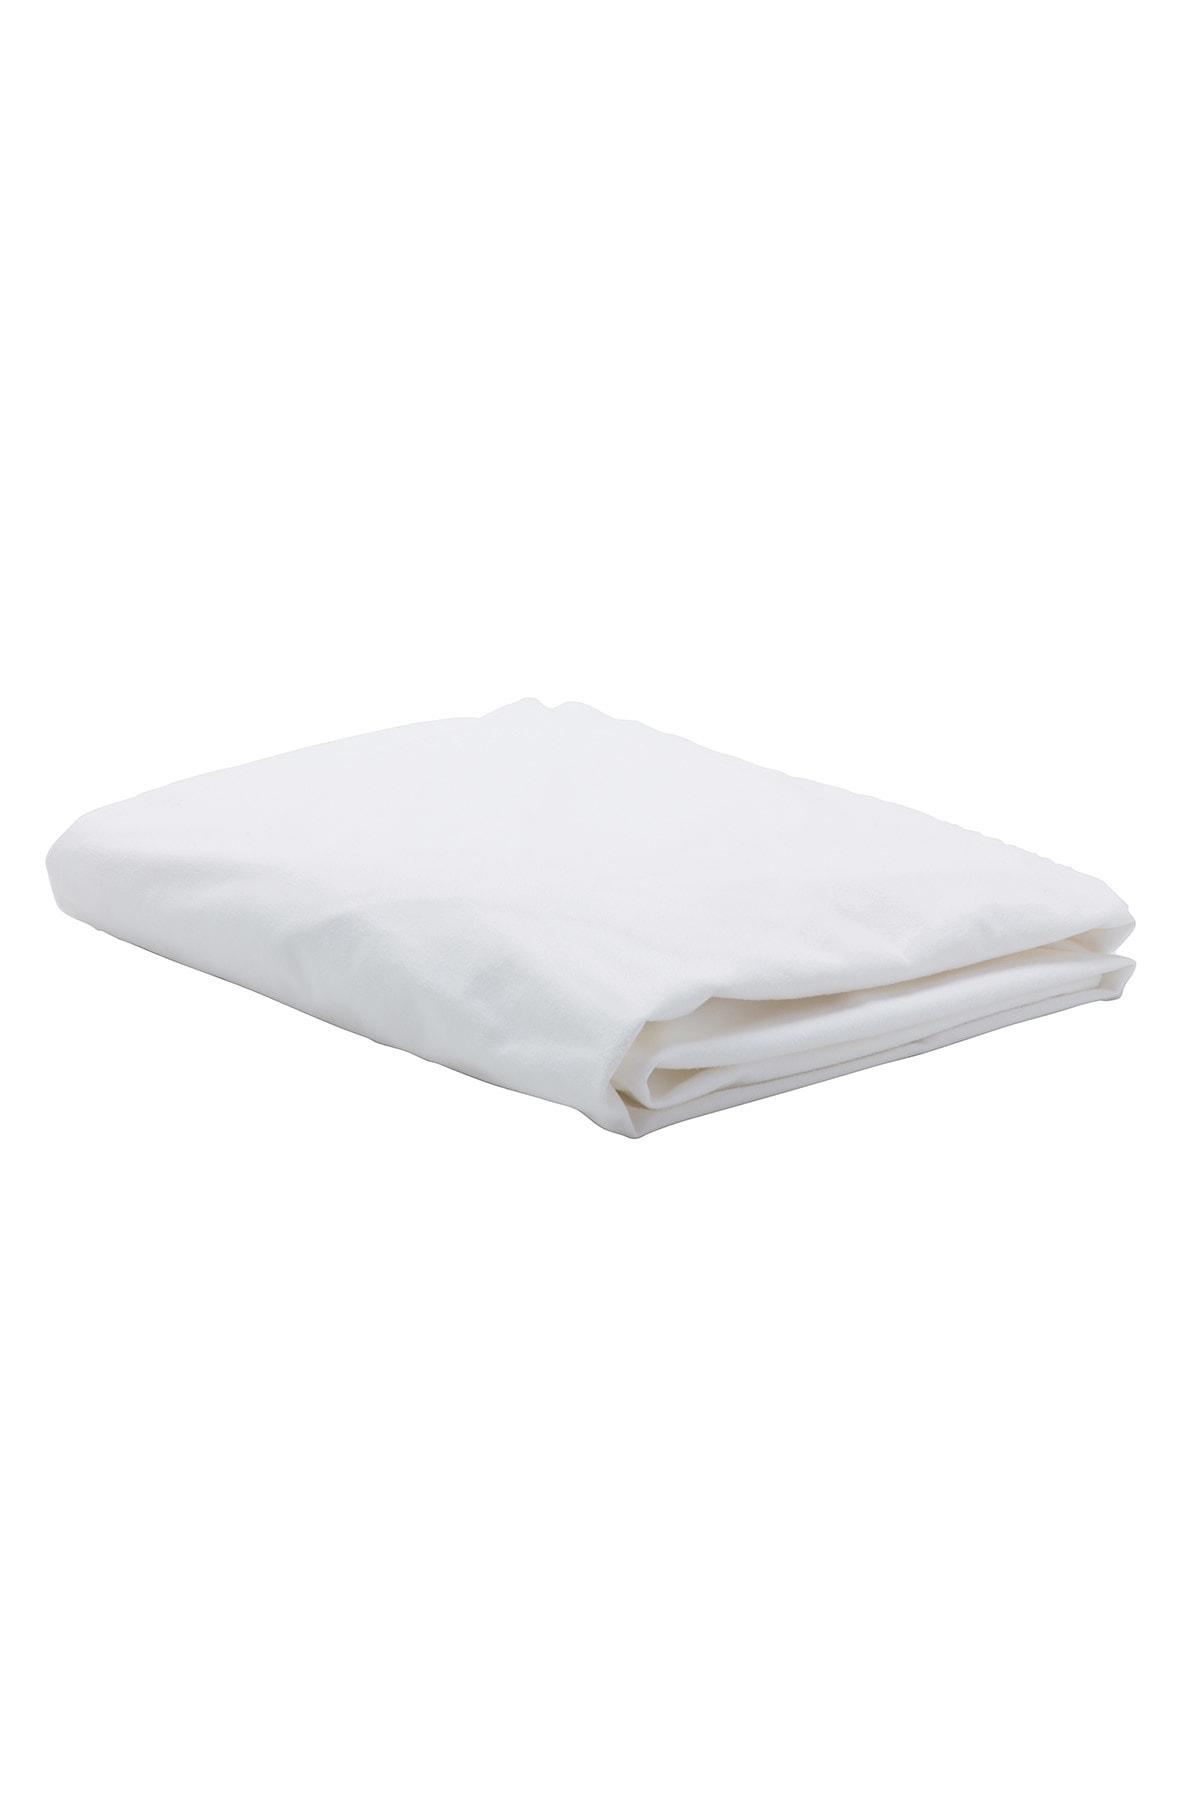 Yataş Bedding Micro Fit Su Geçirmez Alez